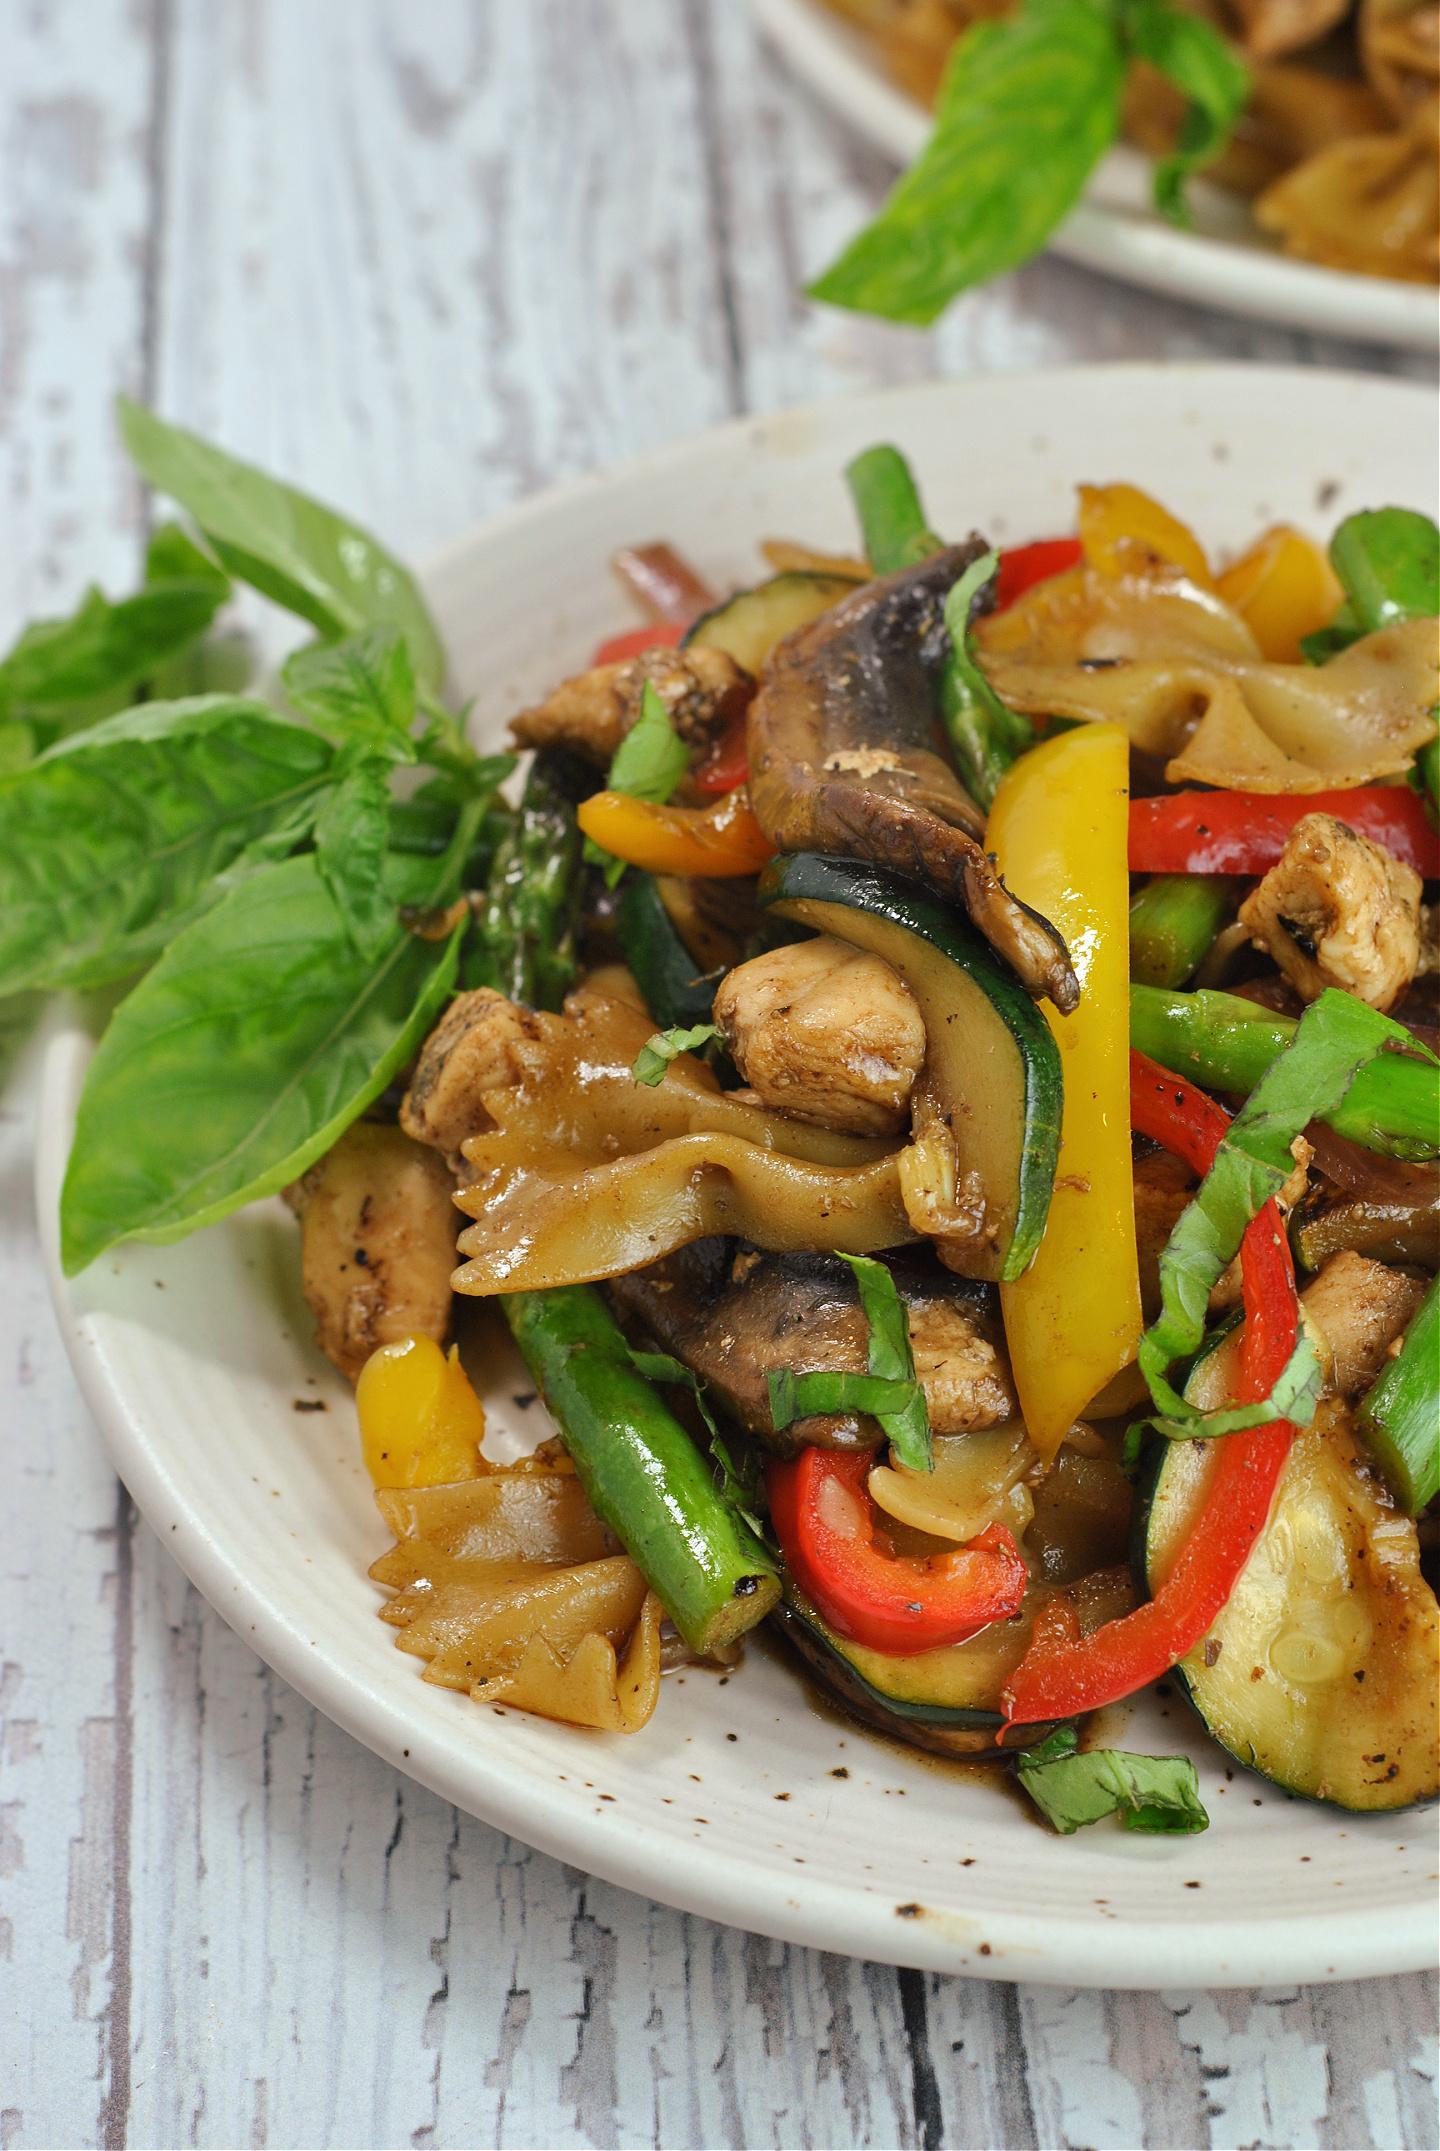 Honey Balsamic Pasta with Chicken and Veggies via @preventionrd